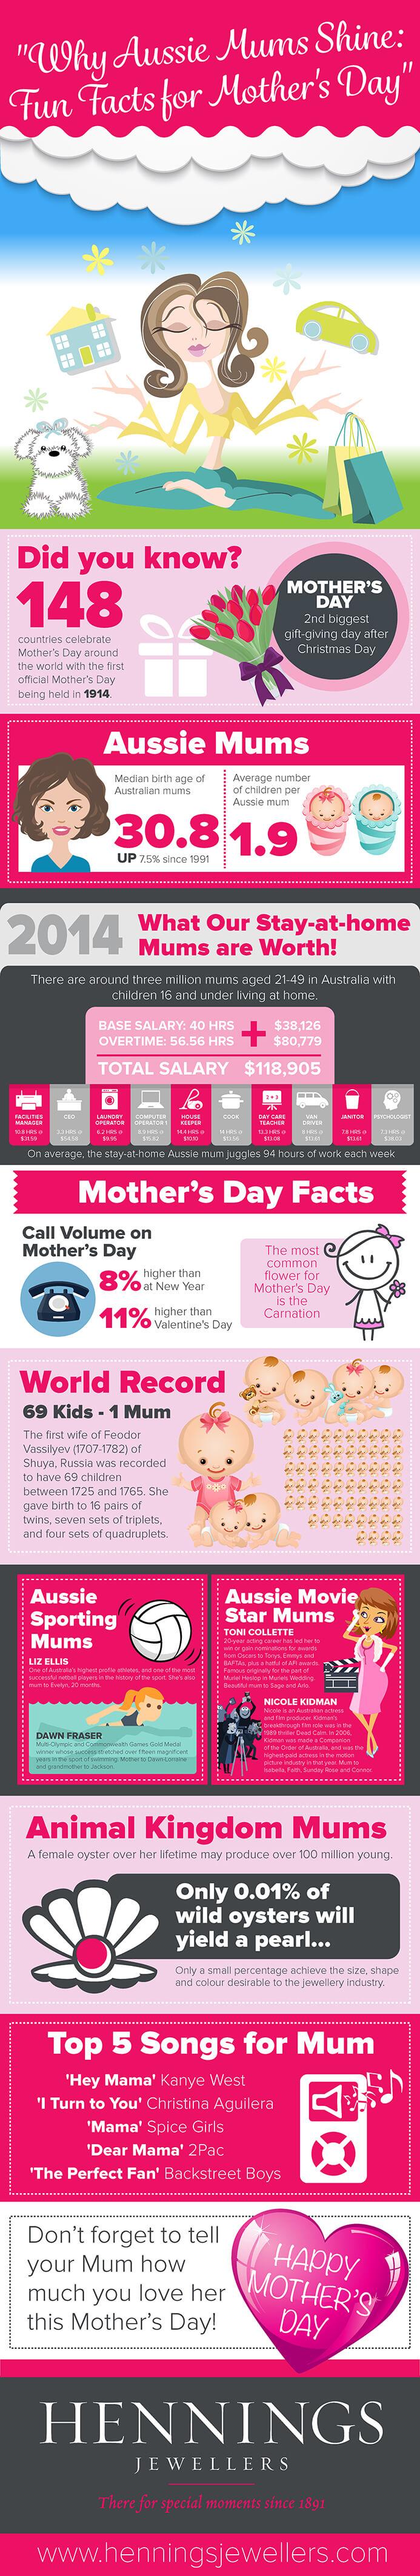 Hennings-infographic